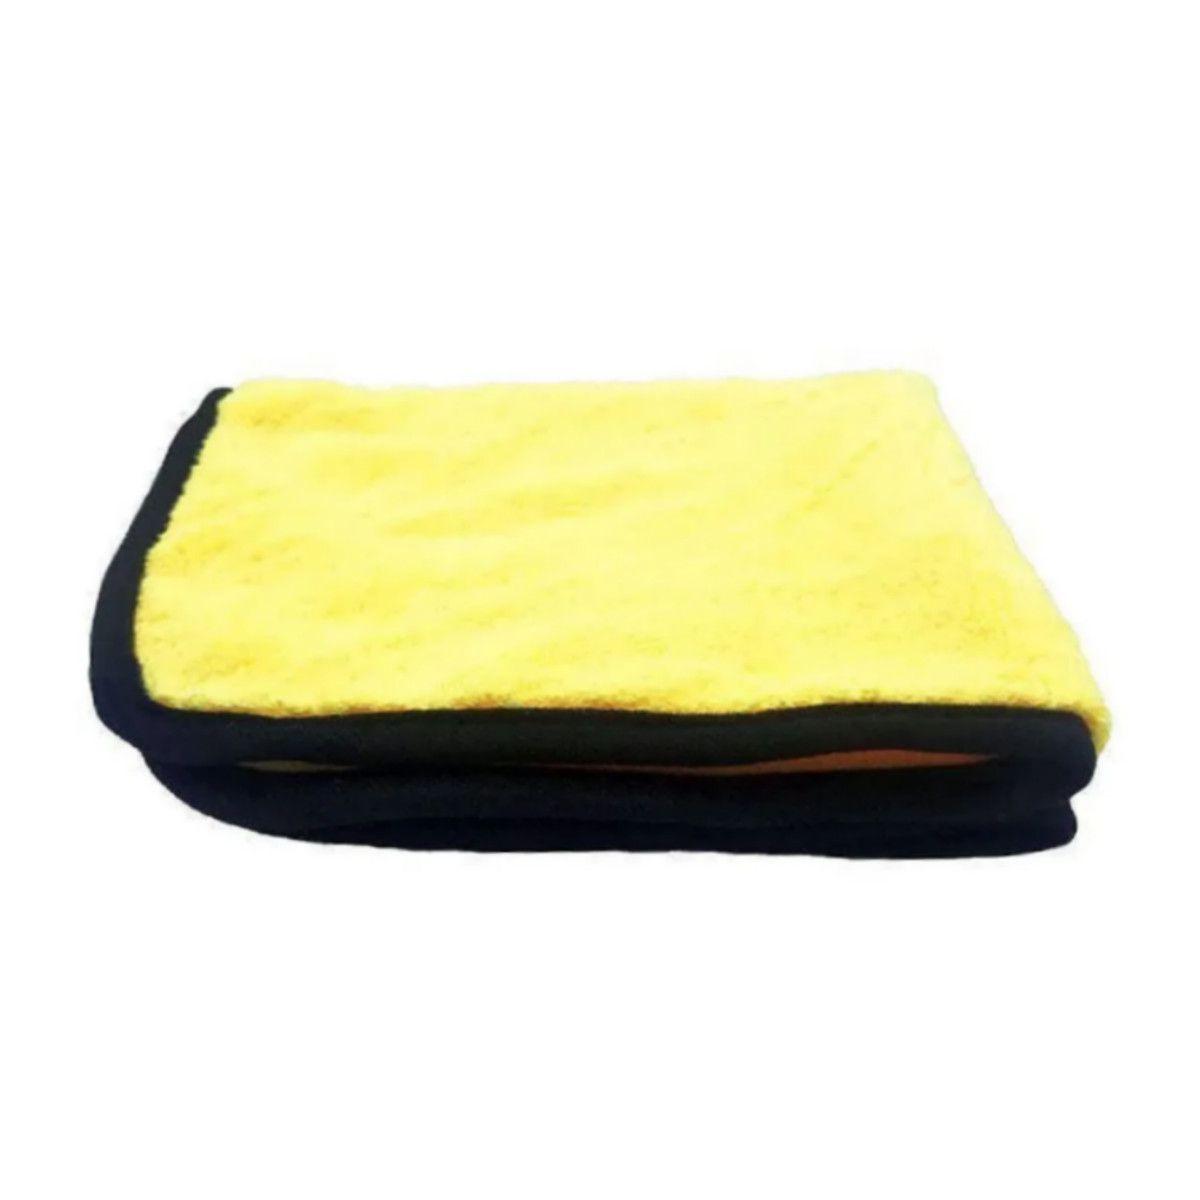 Kit Polijet Borrifador 500ml + Refil 5kg  (Brinde Microfibra Amarela)